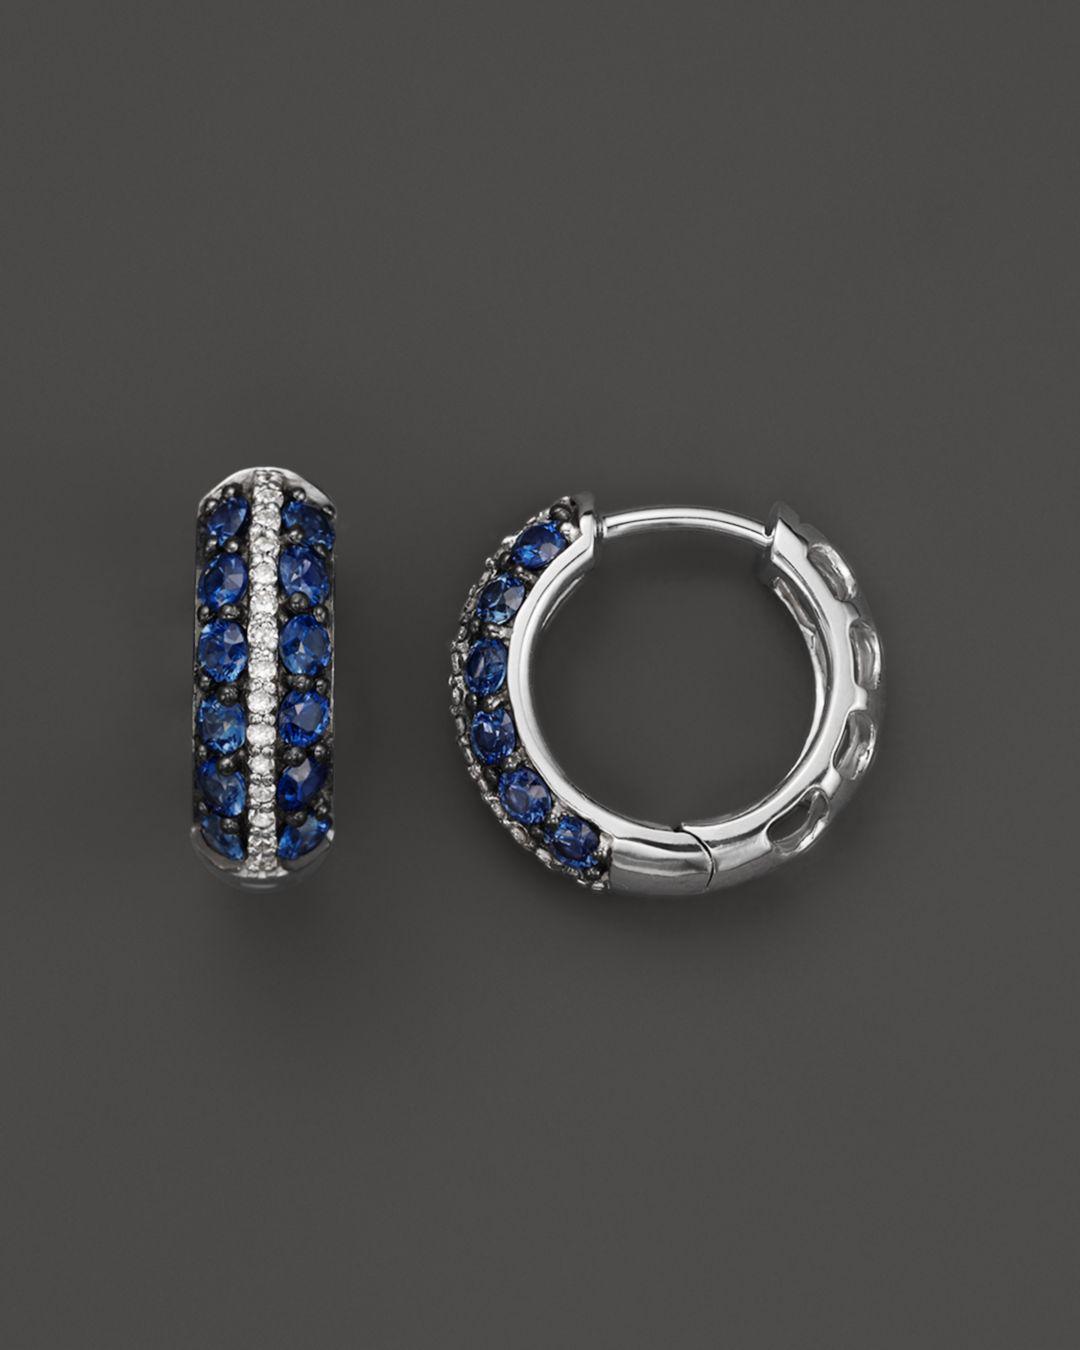 9693a958524fc7 Bloomingdale's. Women's Blue Sapphire And Diamond Huggie Hoop Earrings In  14k White Gold